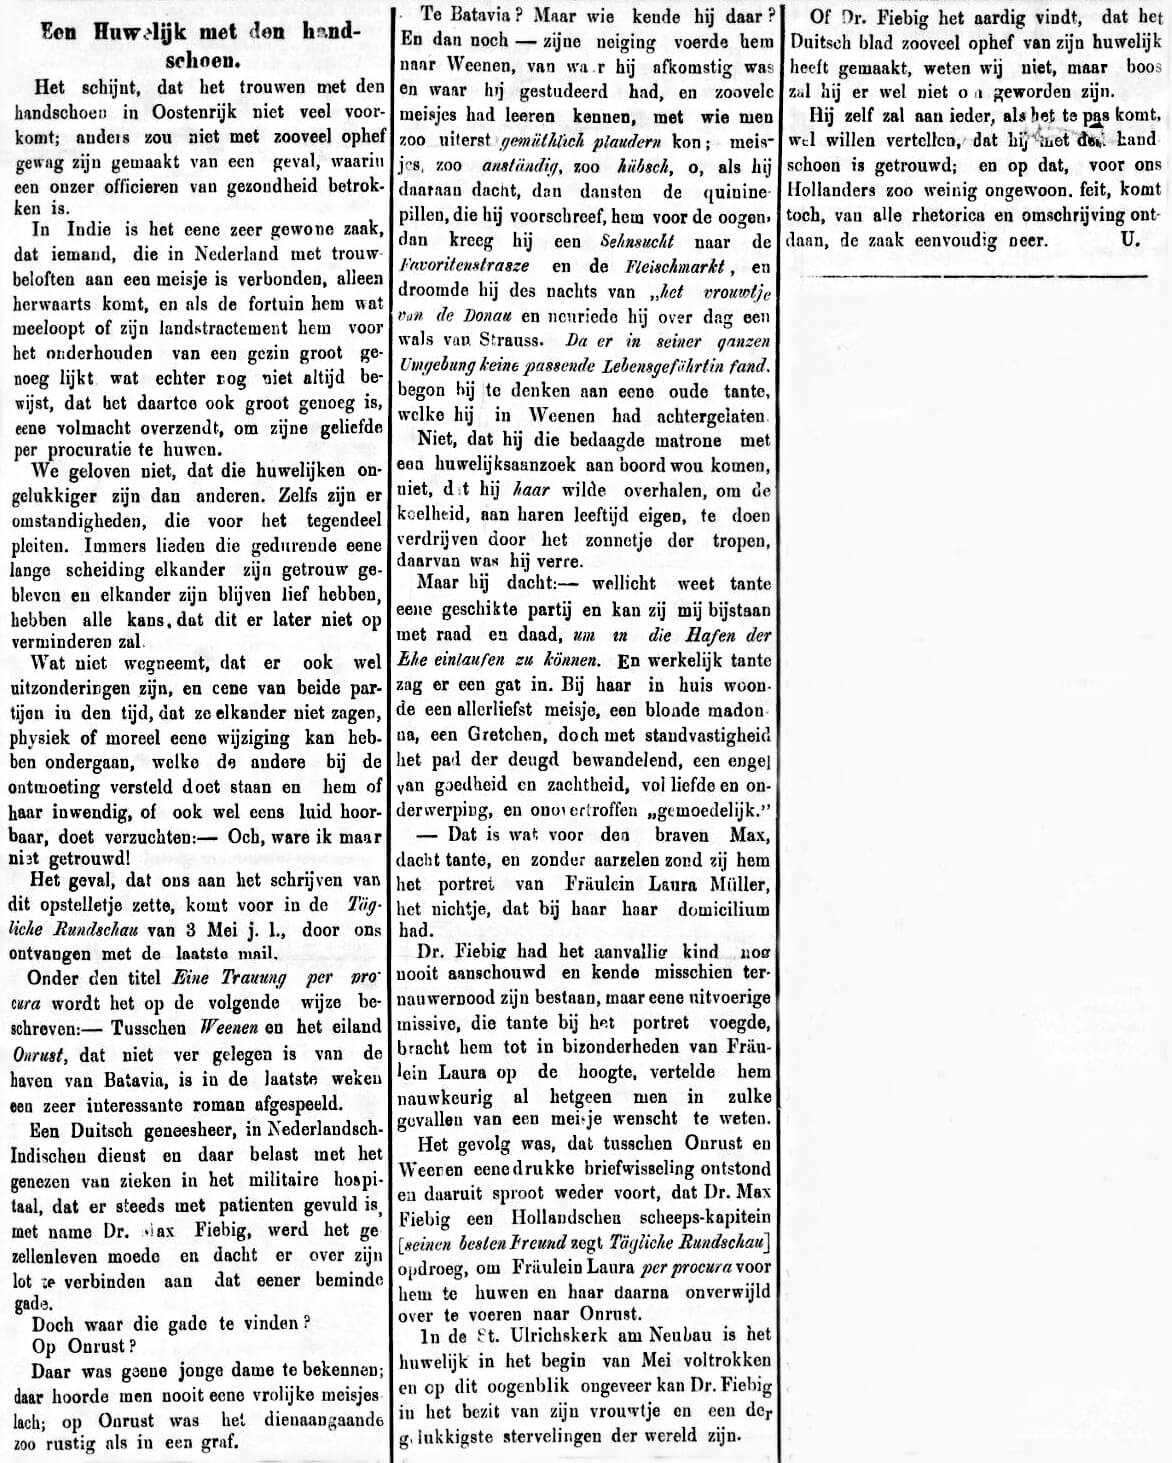 Soerabaijasch Handelsblad van 16 juni 1884